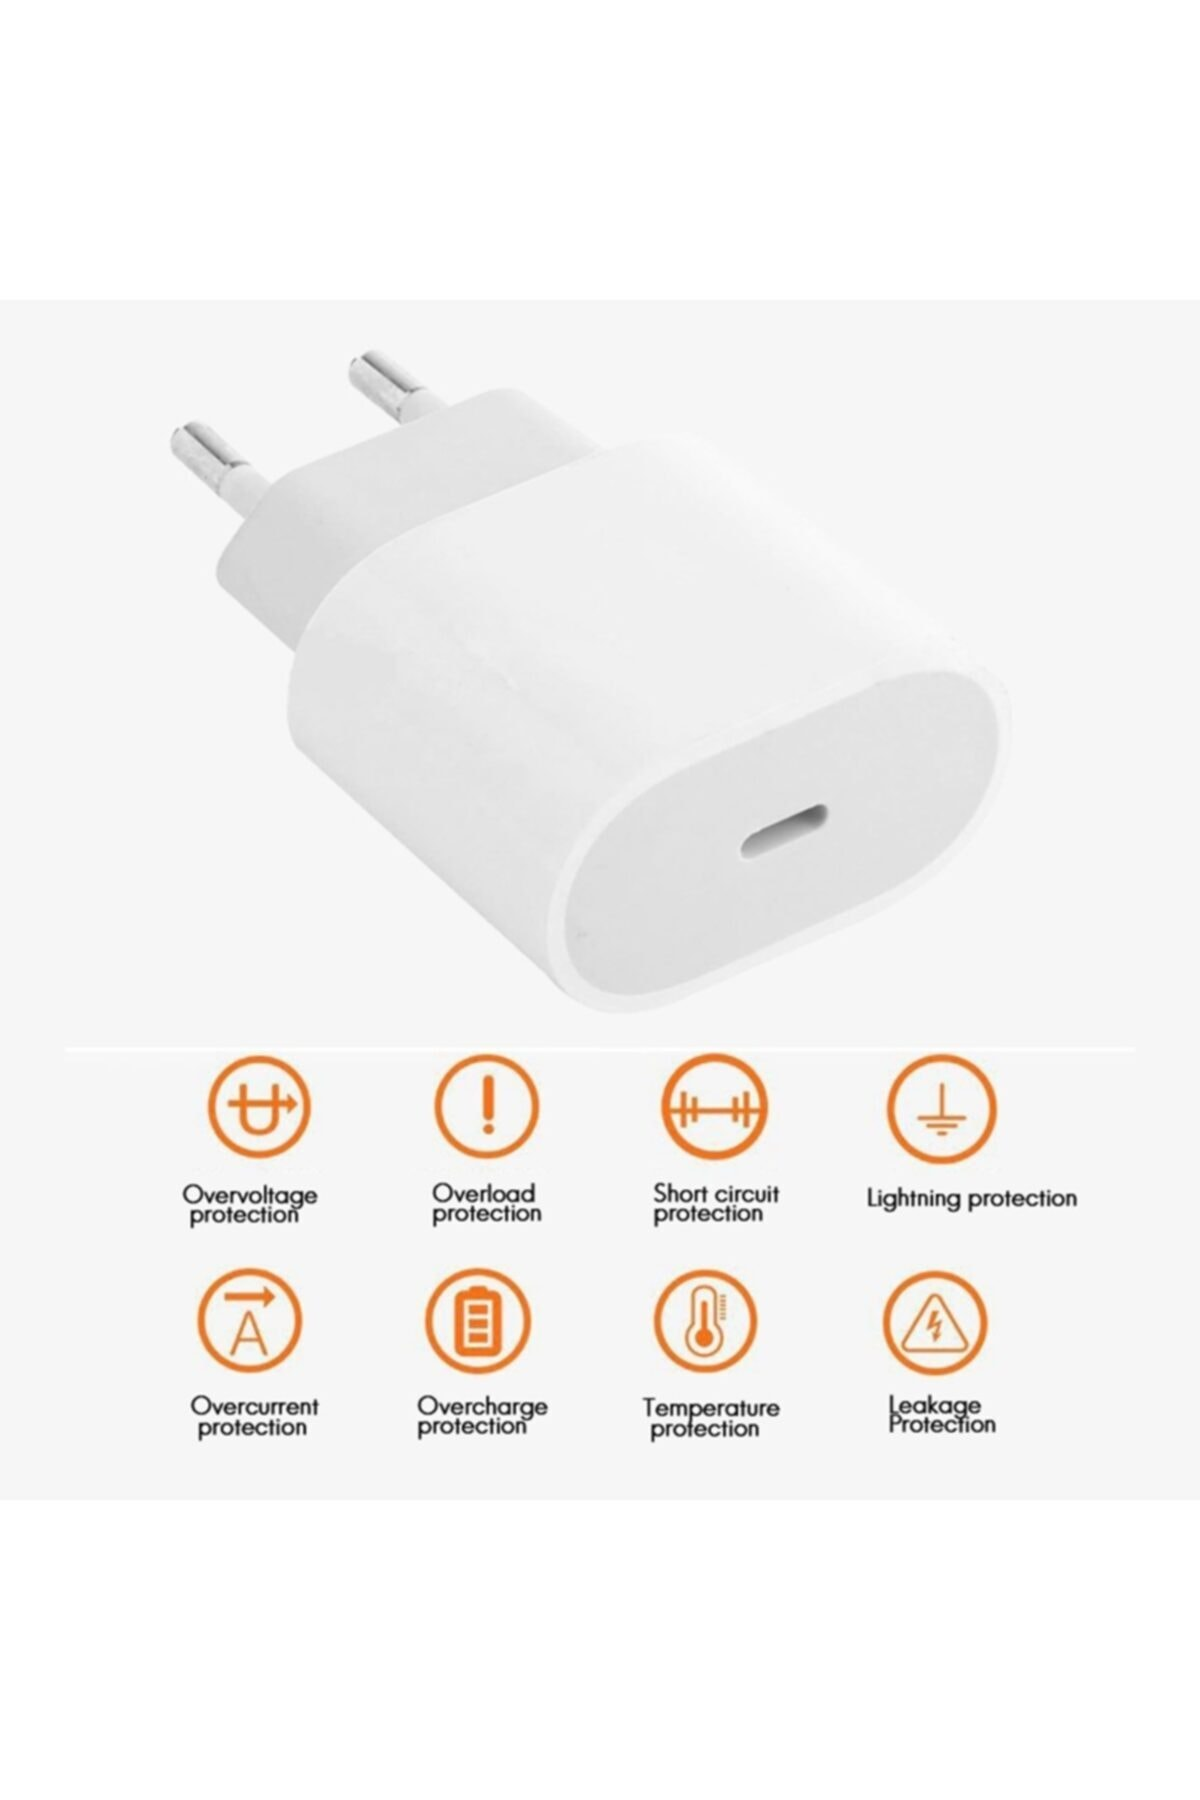 Revix Apple Macbook Ipad Iphone 11 / 12 - Pro Max Mini Uyumlu 20w Adaptör Kablo Usb-c Pd Hızlı Şarj Aleti 2